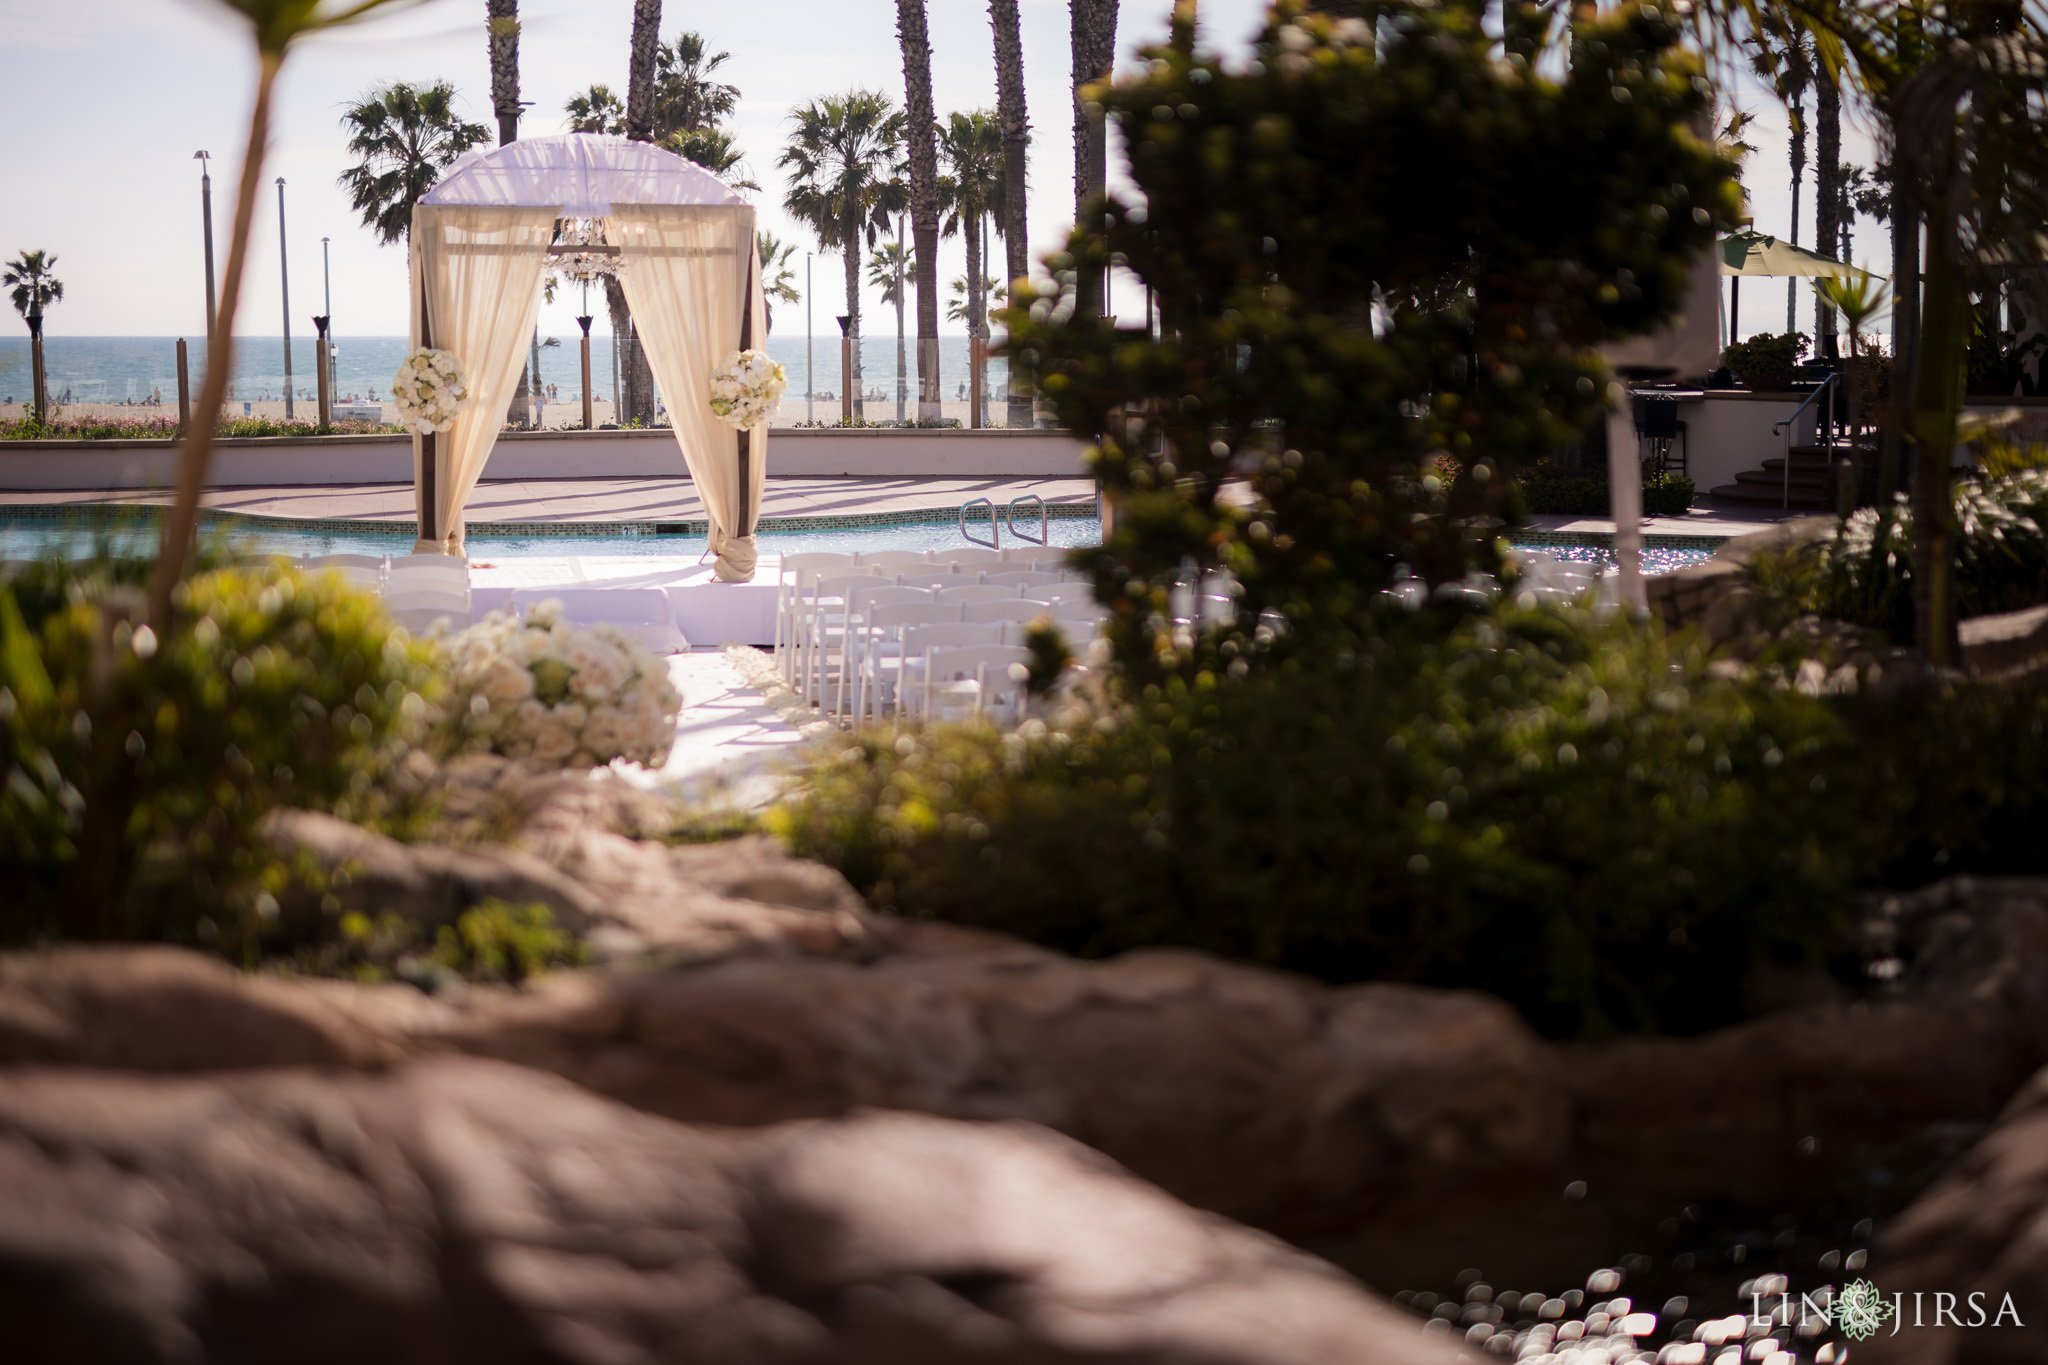 12 huntington beach hilton waterfront - wedding venues in huntington beach